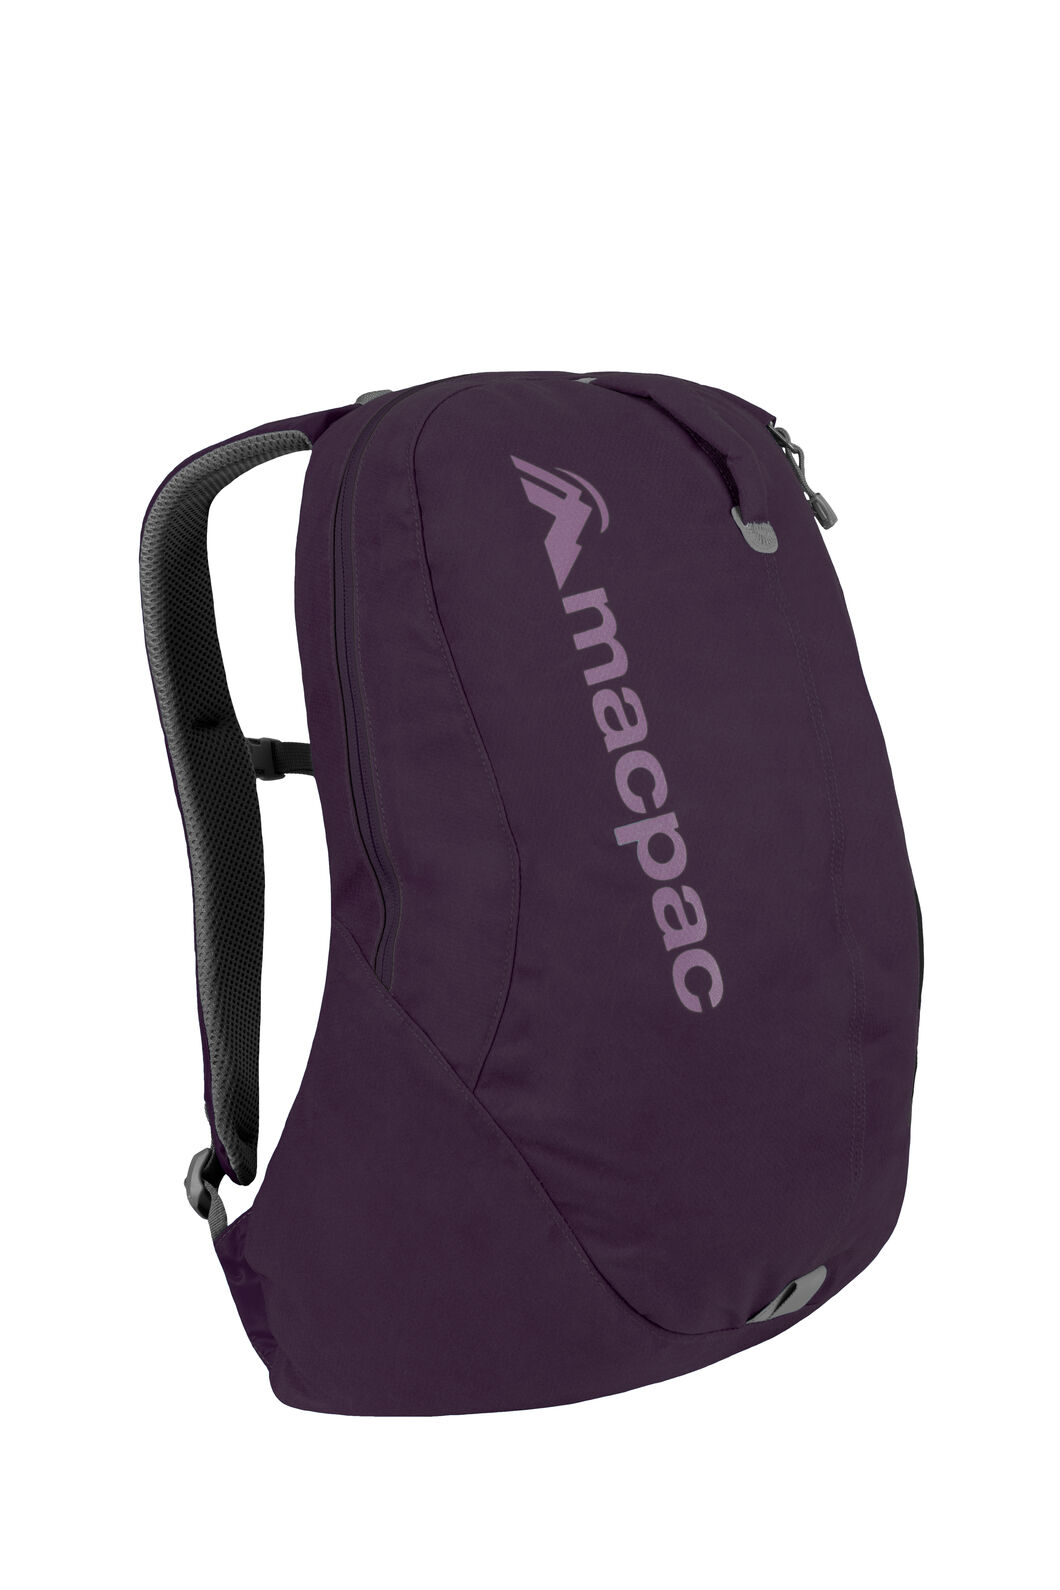 Macpac Kahu 22L AzTec® Pack V2, Potent Purple, hi-res